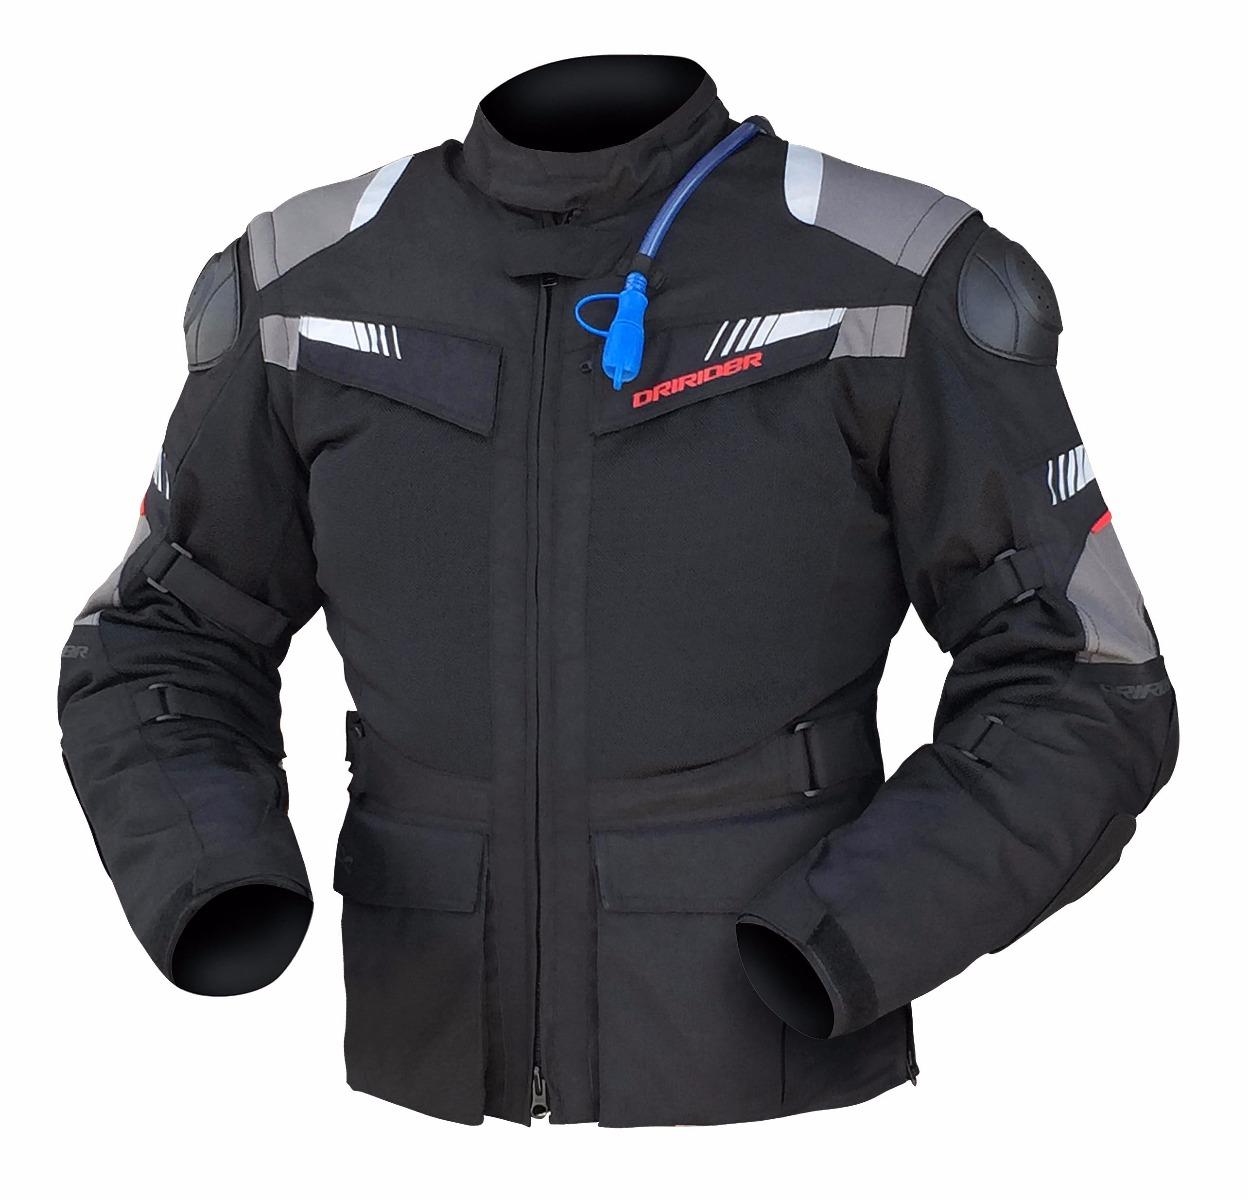 Dririder Rallycross Pro 3 Black/Black Jacket